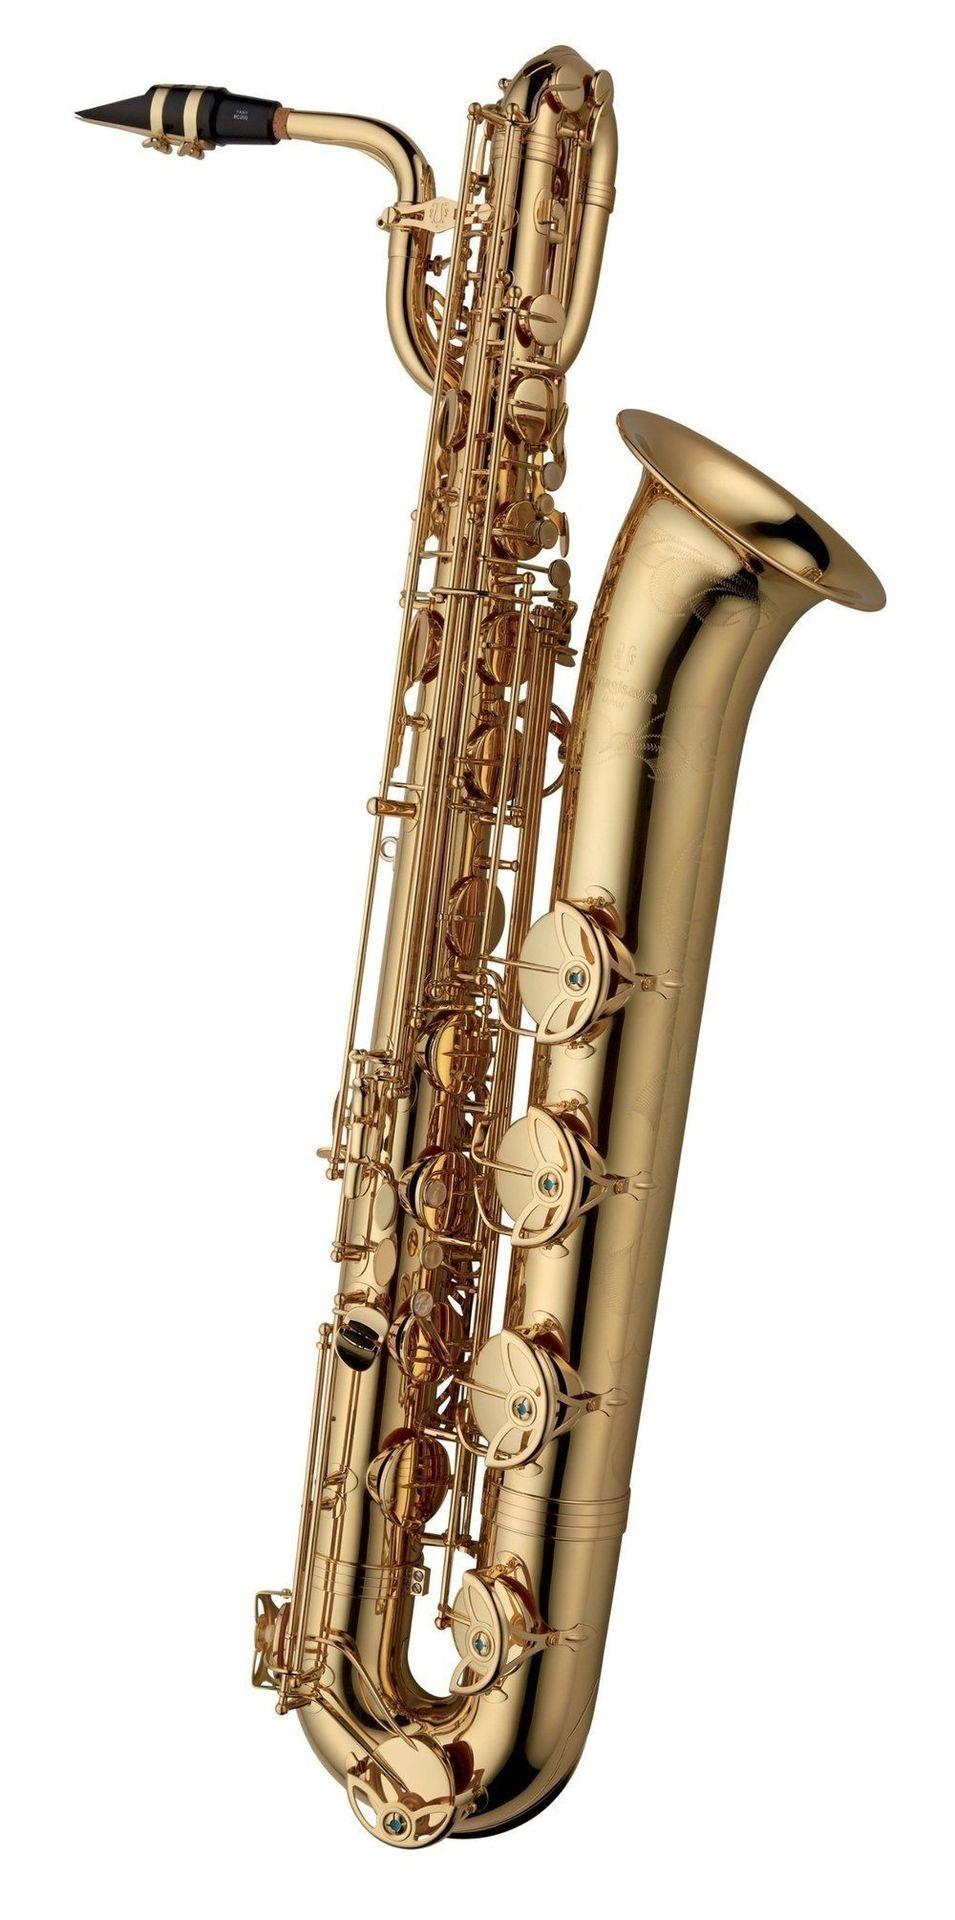 Yanagisawa B-WO1 Baritonsaxophon, tief A, hoch Fis, incl. Koffer u. Zubehör